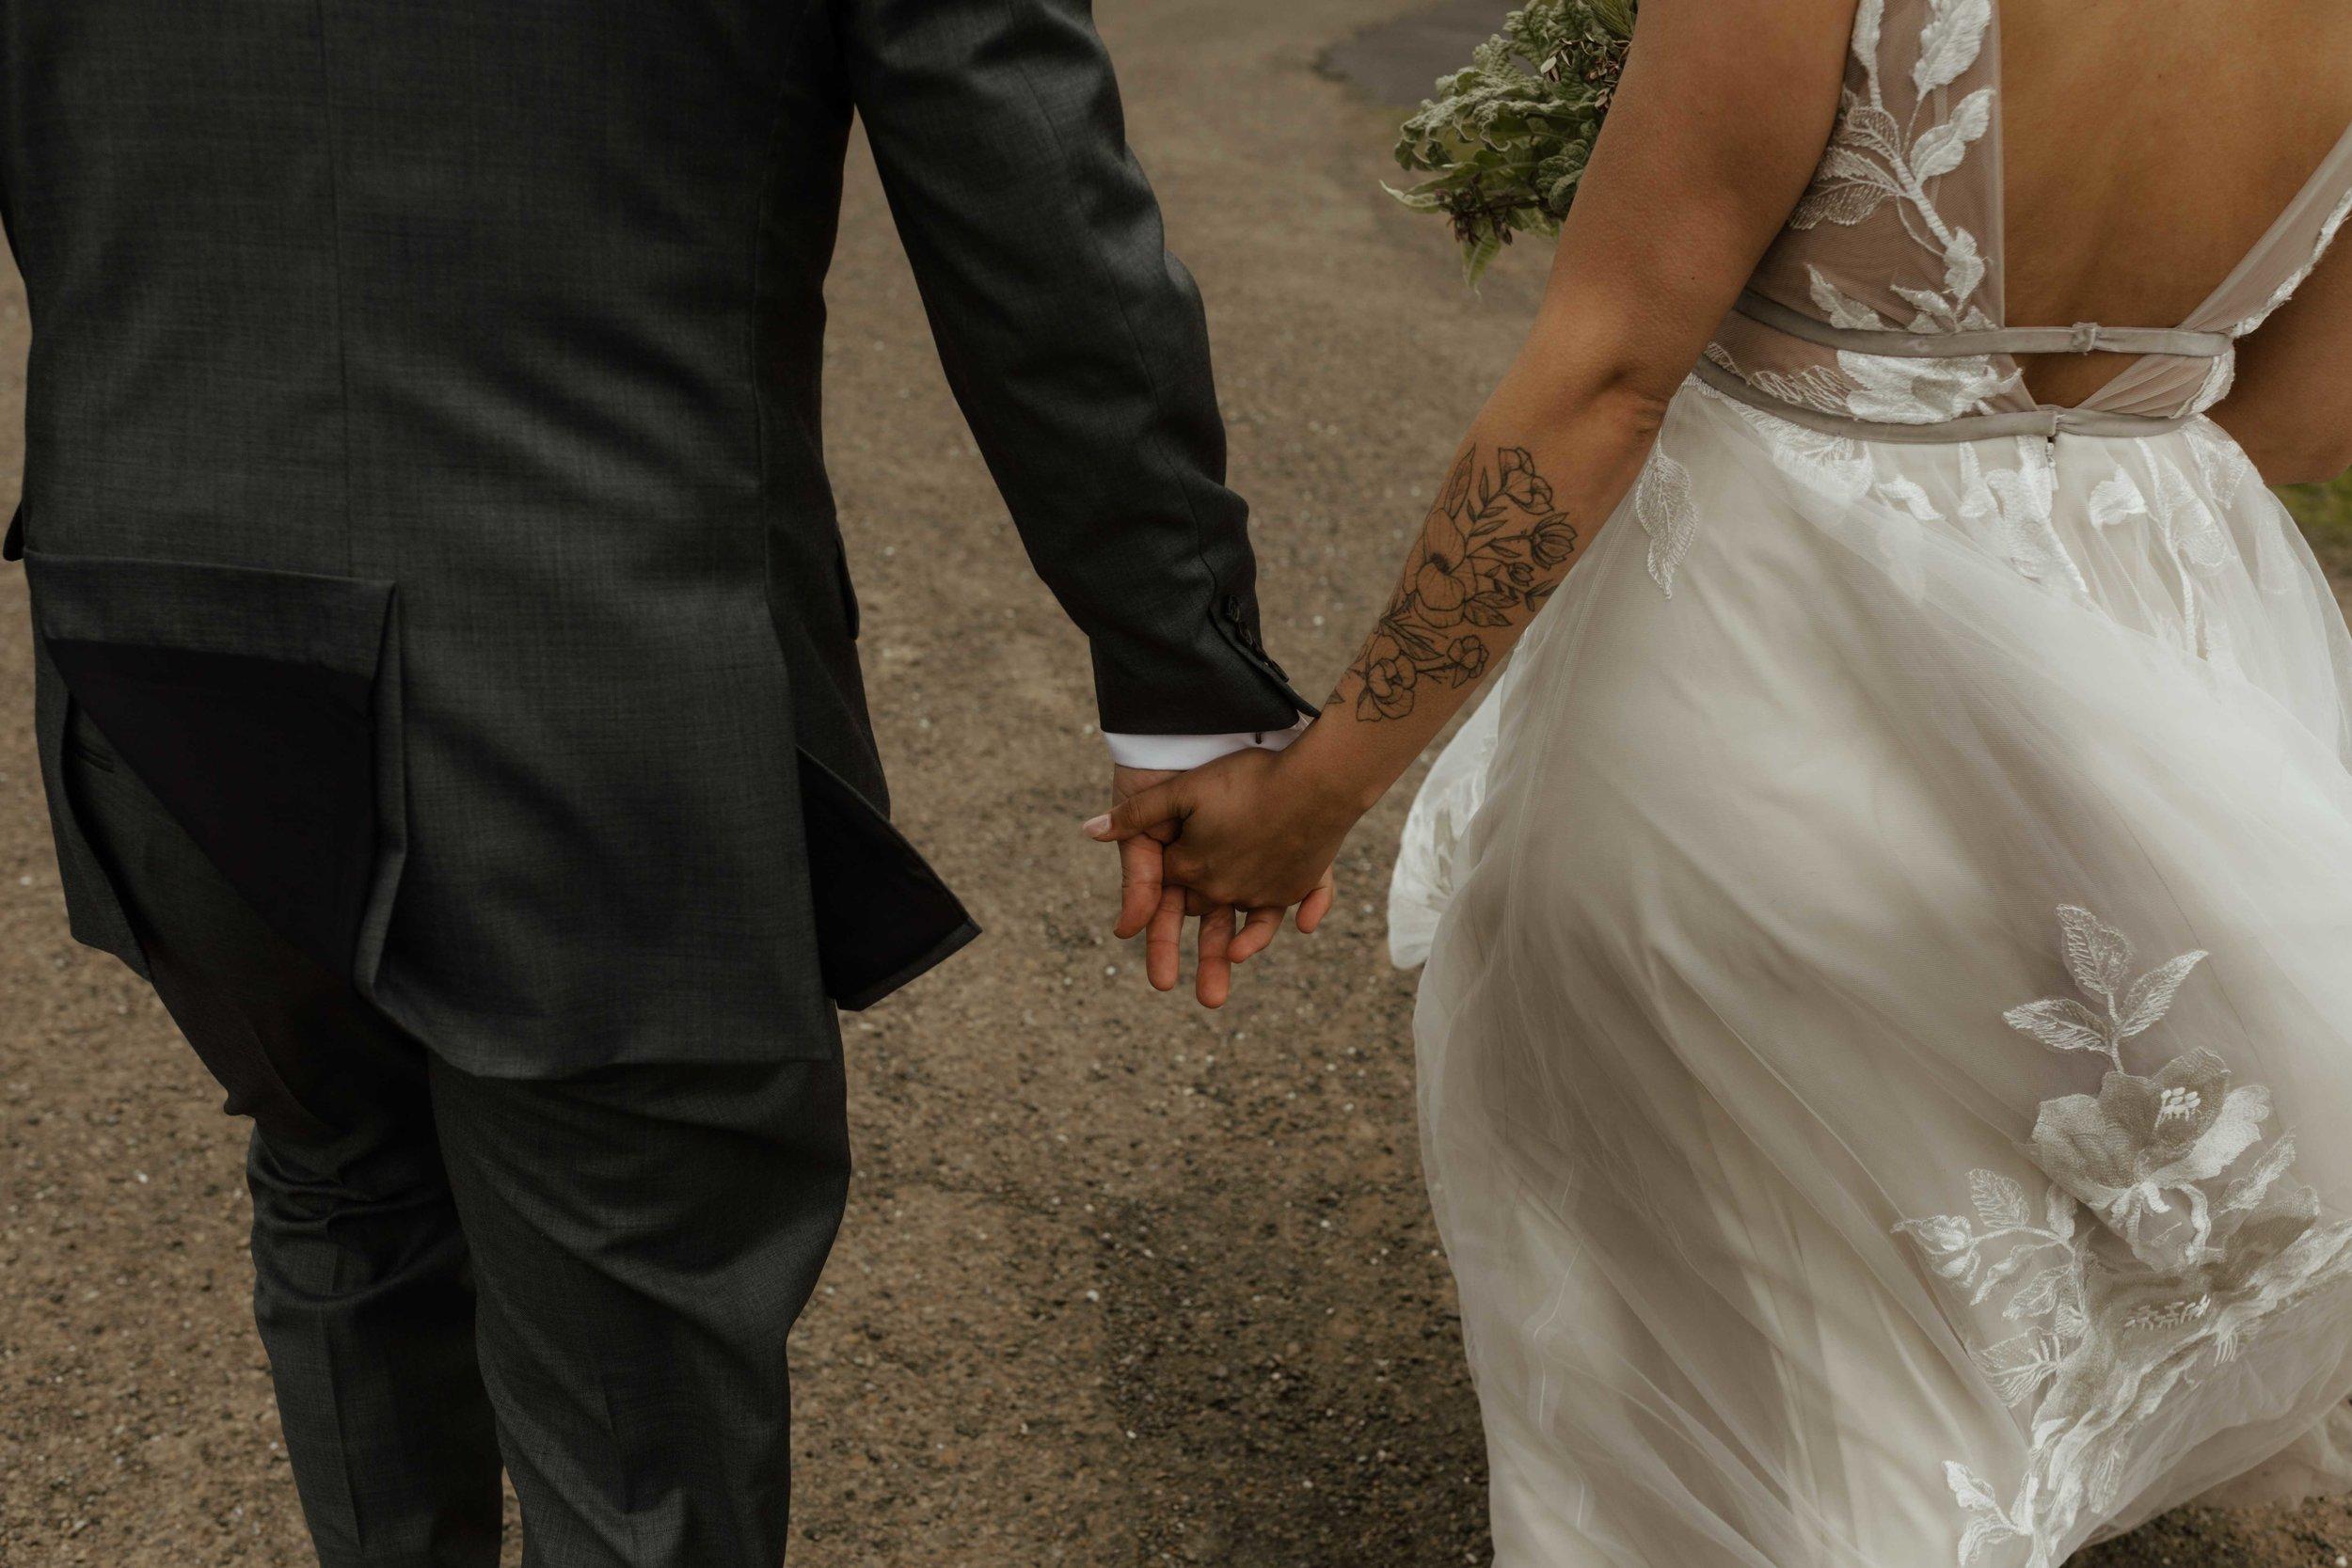 bride and groom running away together spokane wedding